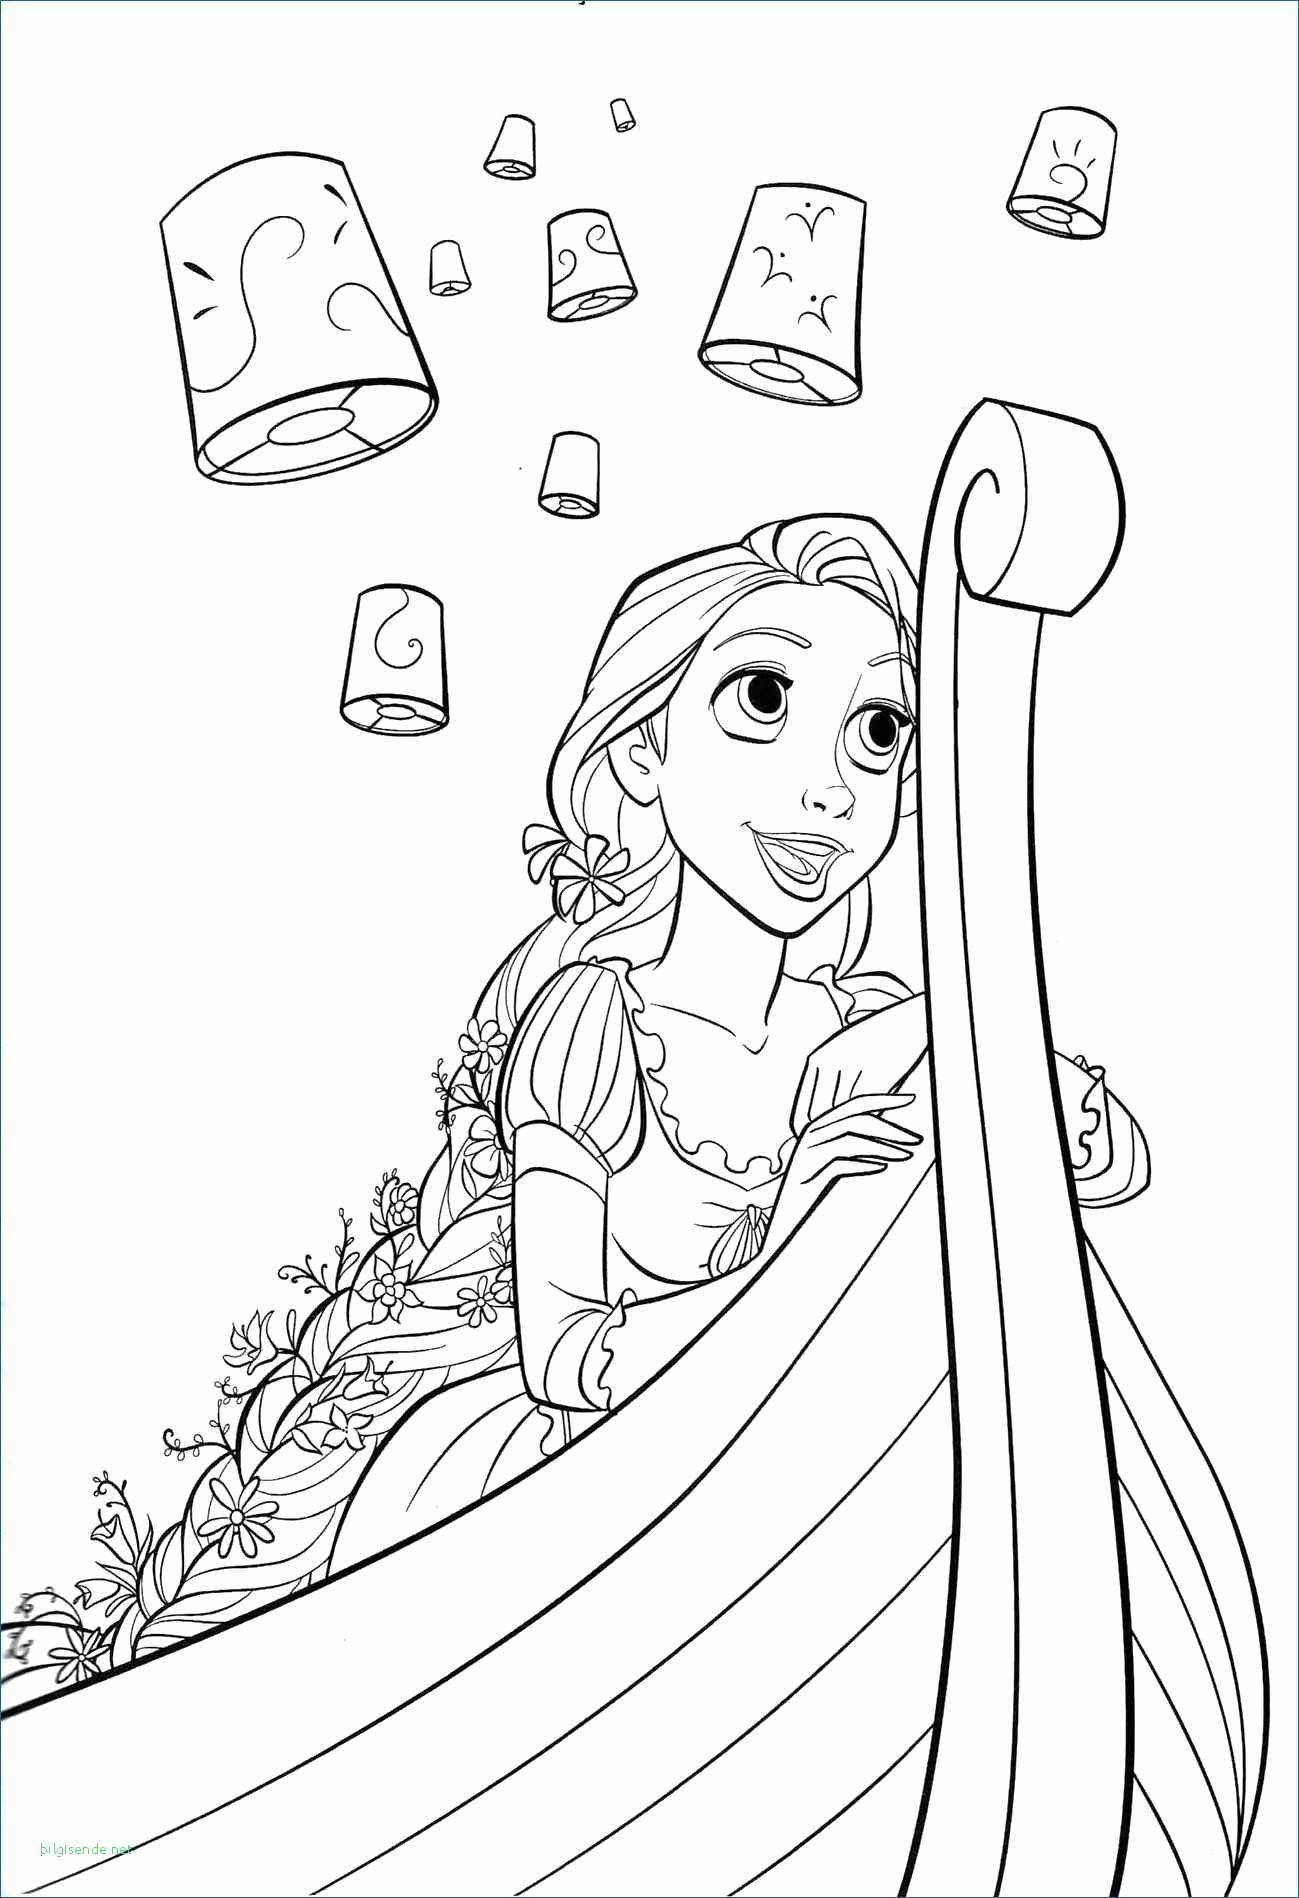 Tangled Disney Drawing Book Beautiful Tangled Coloring Pages in 2020   Tangled  coloring pages, Disney princess coloring pages, Princess coloring pages